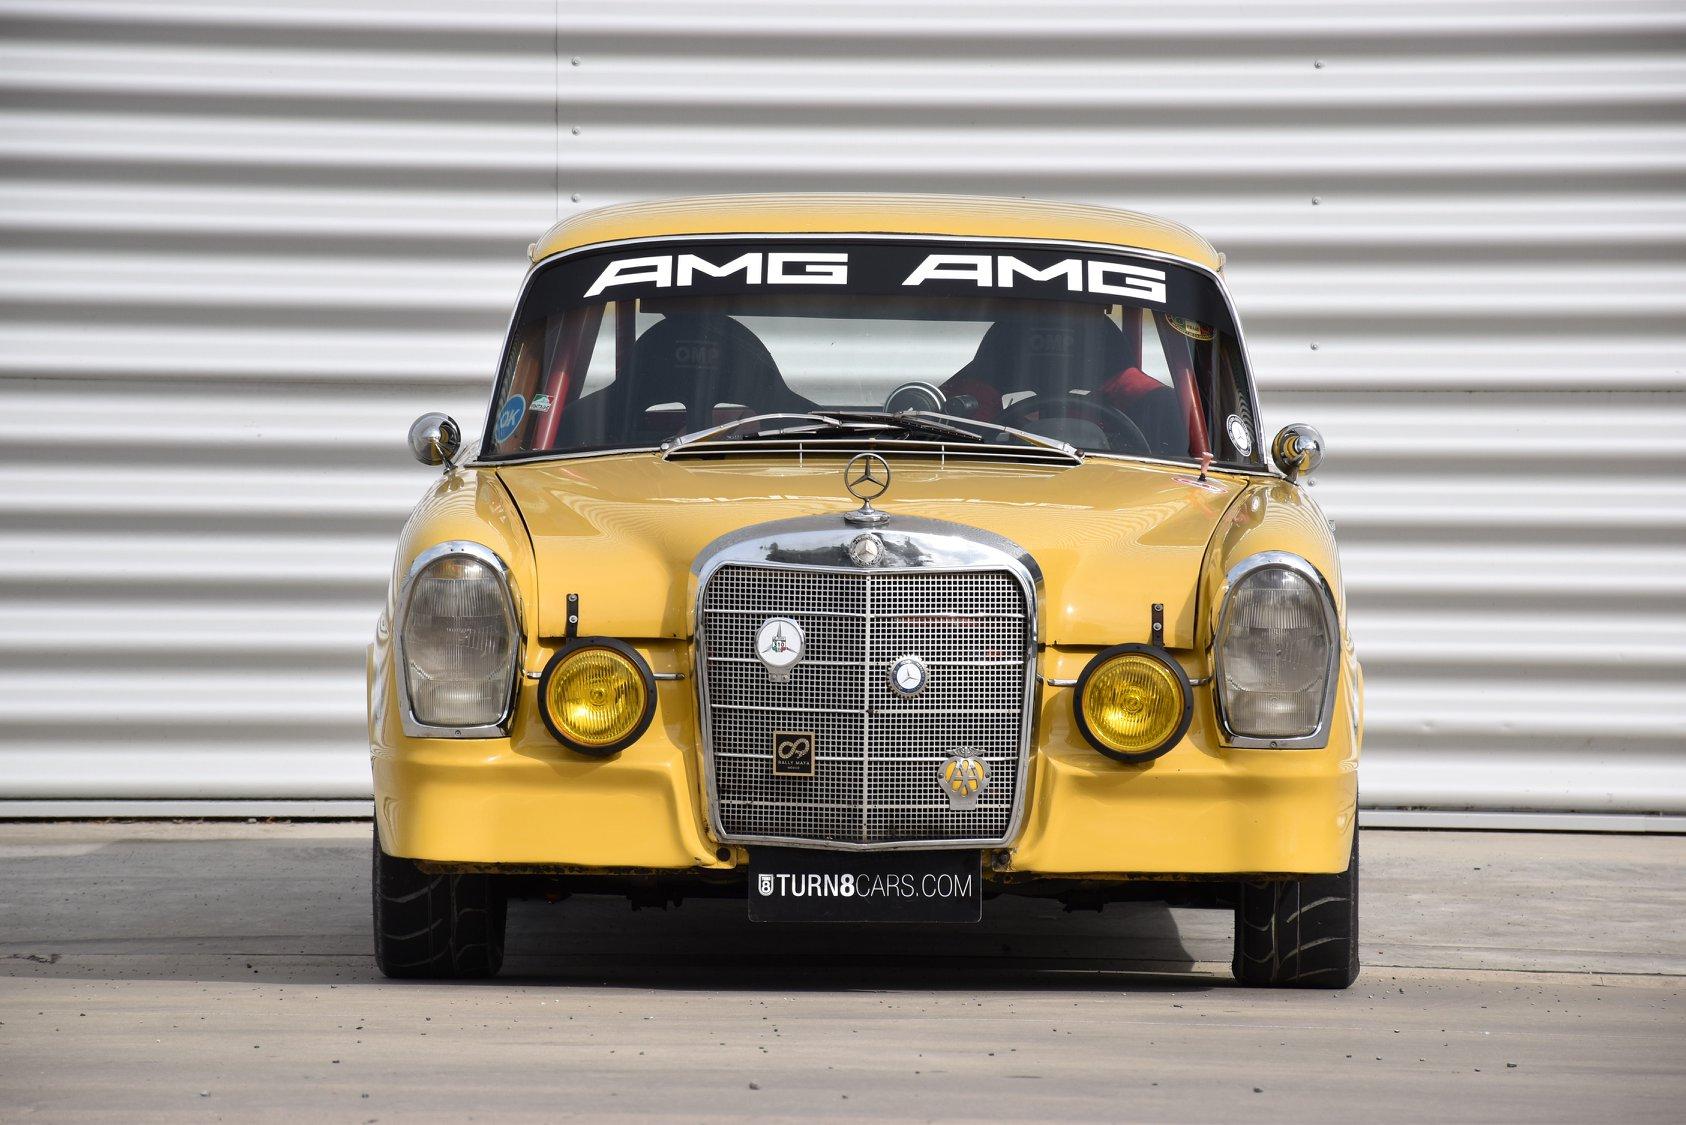 Mercedes-Benz-S-220-AMG-Panamerica-1965--1